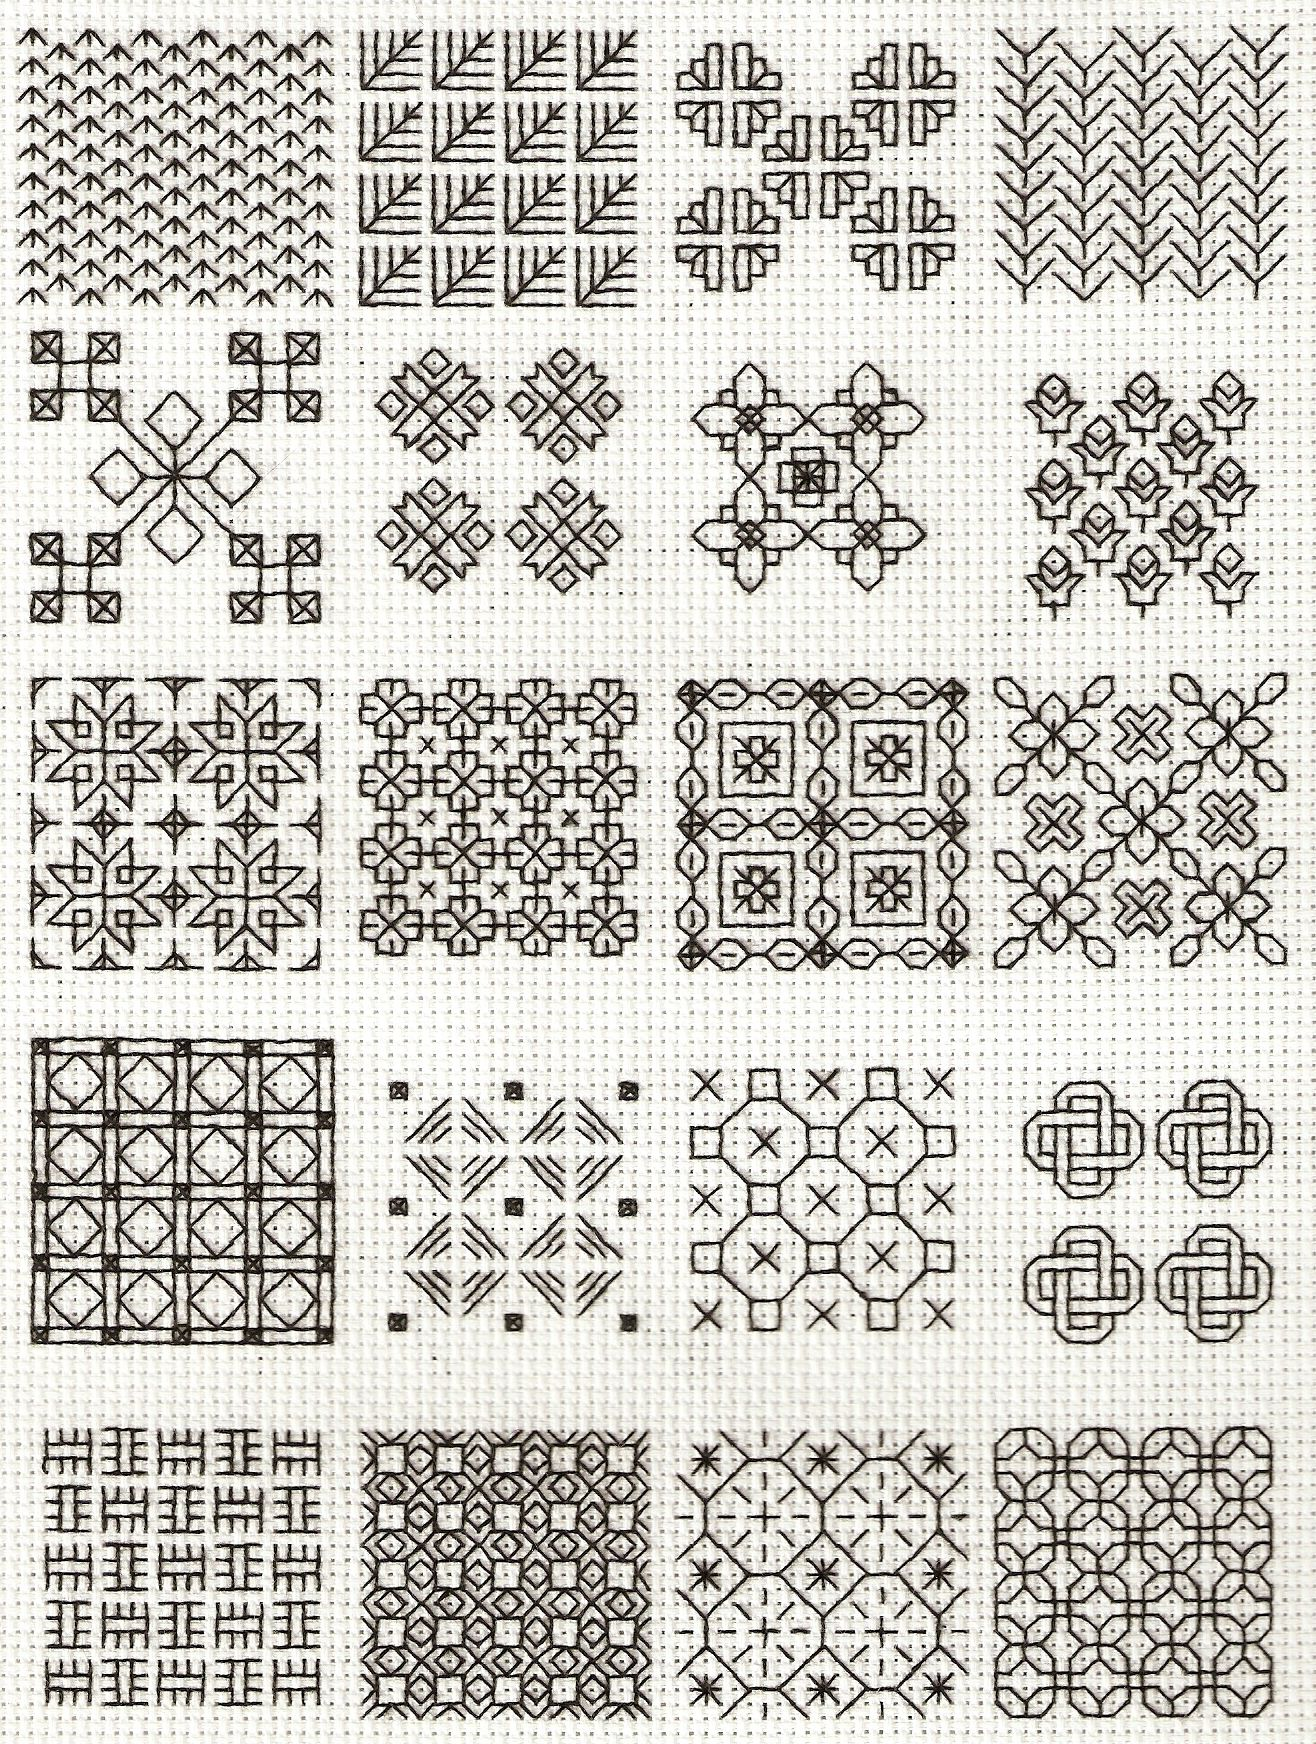 Blackwork Patterns Cool Design Ideas